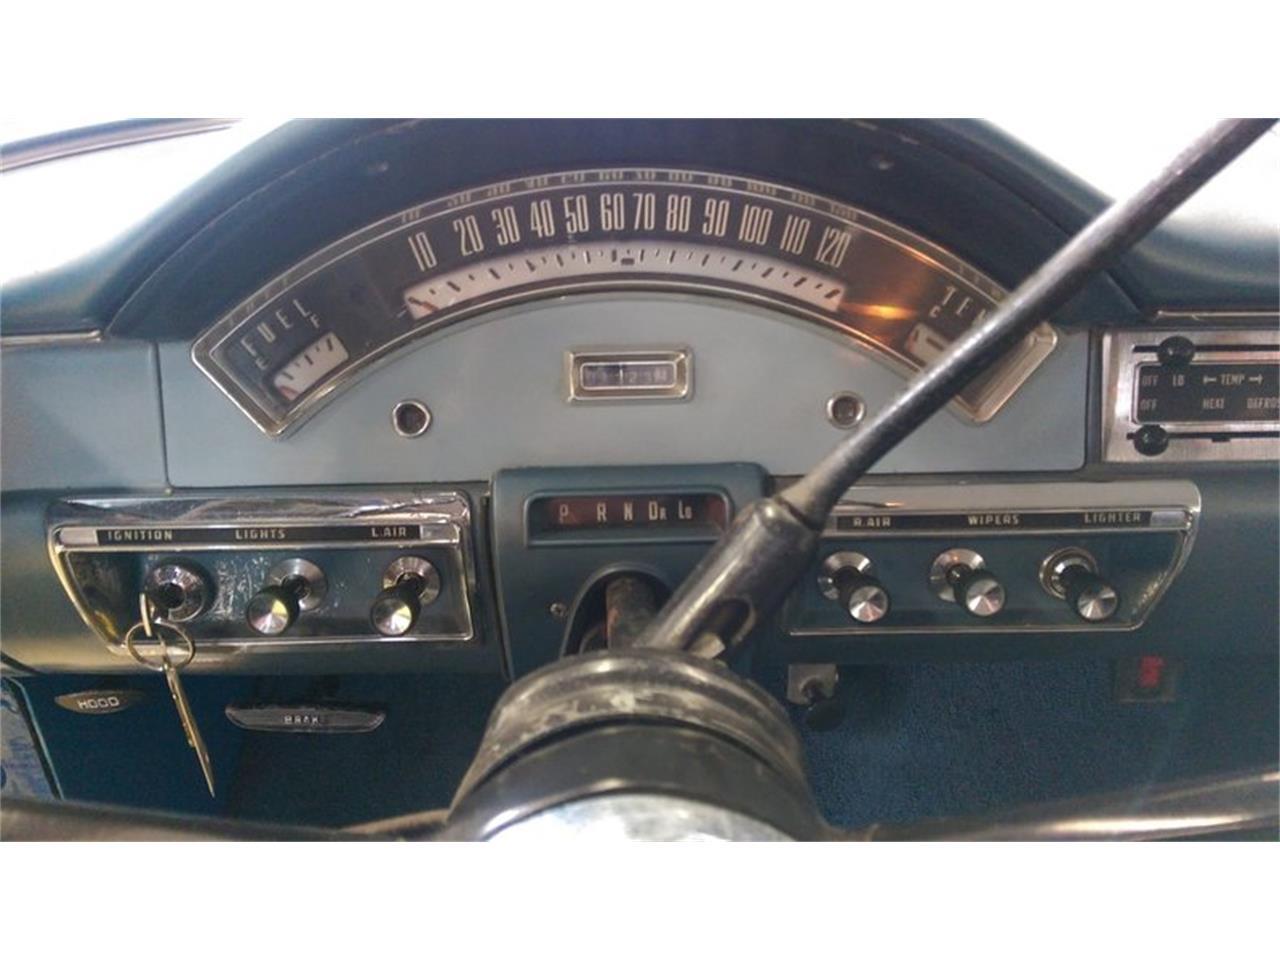 Large Picture of Classic 1957 Fairlane located in Mankato Minnesota - $22,900.00 - LBUF